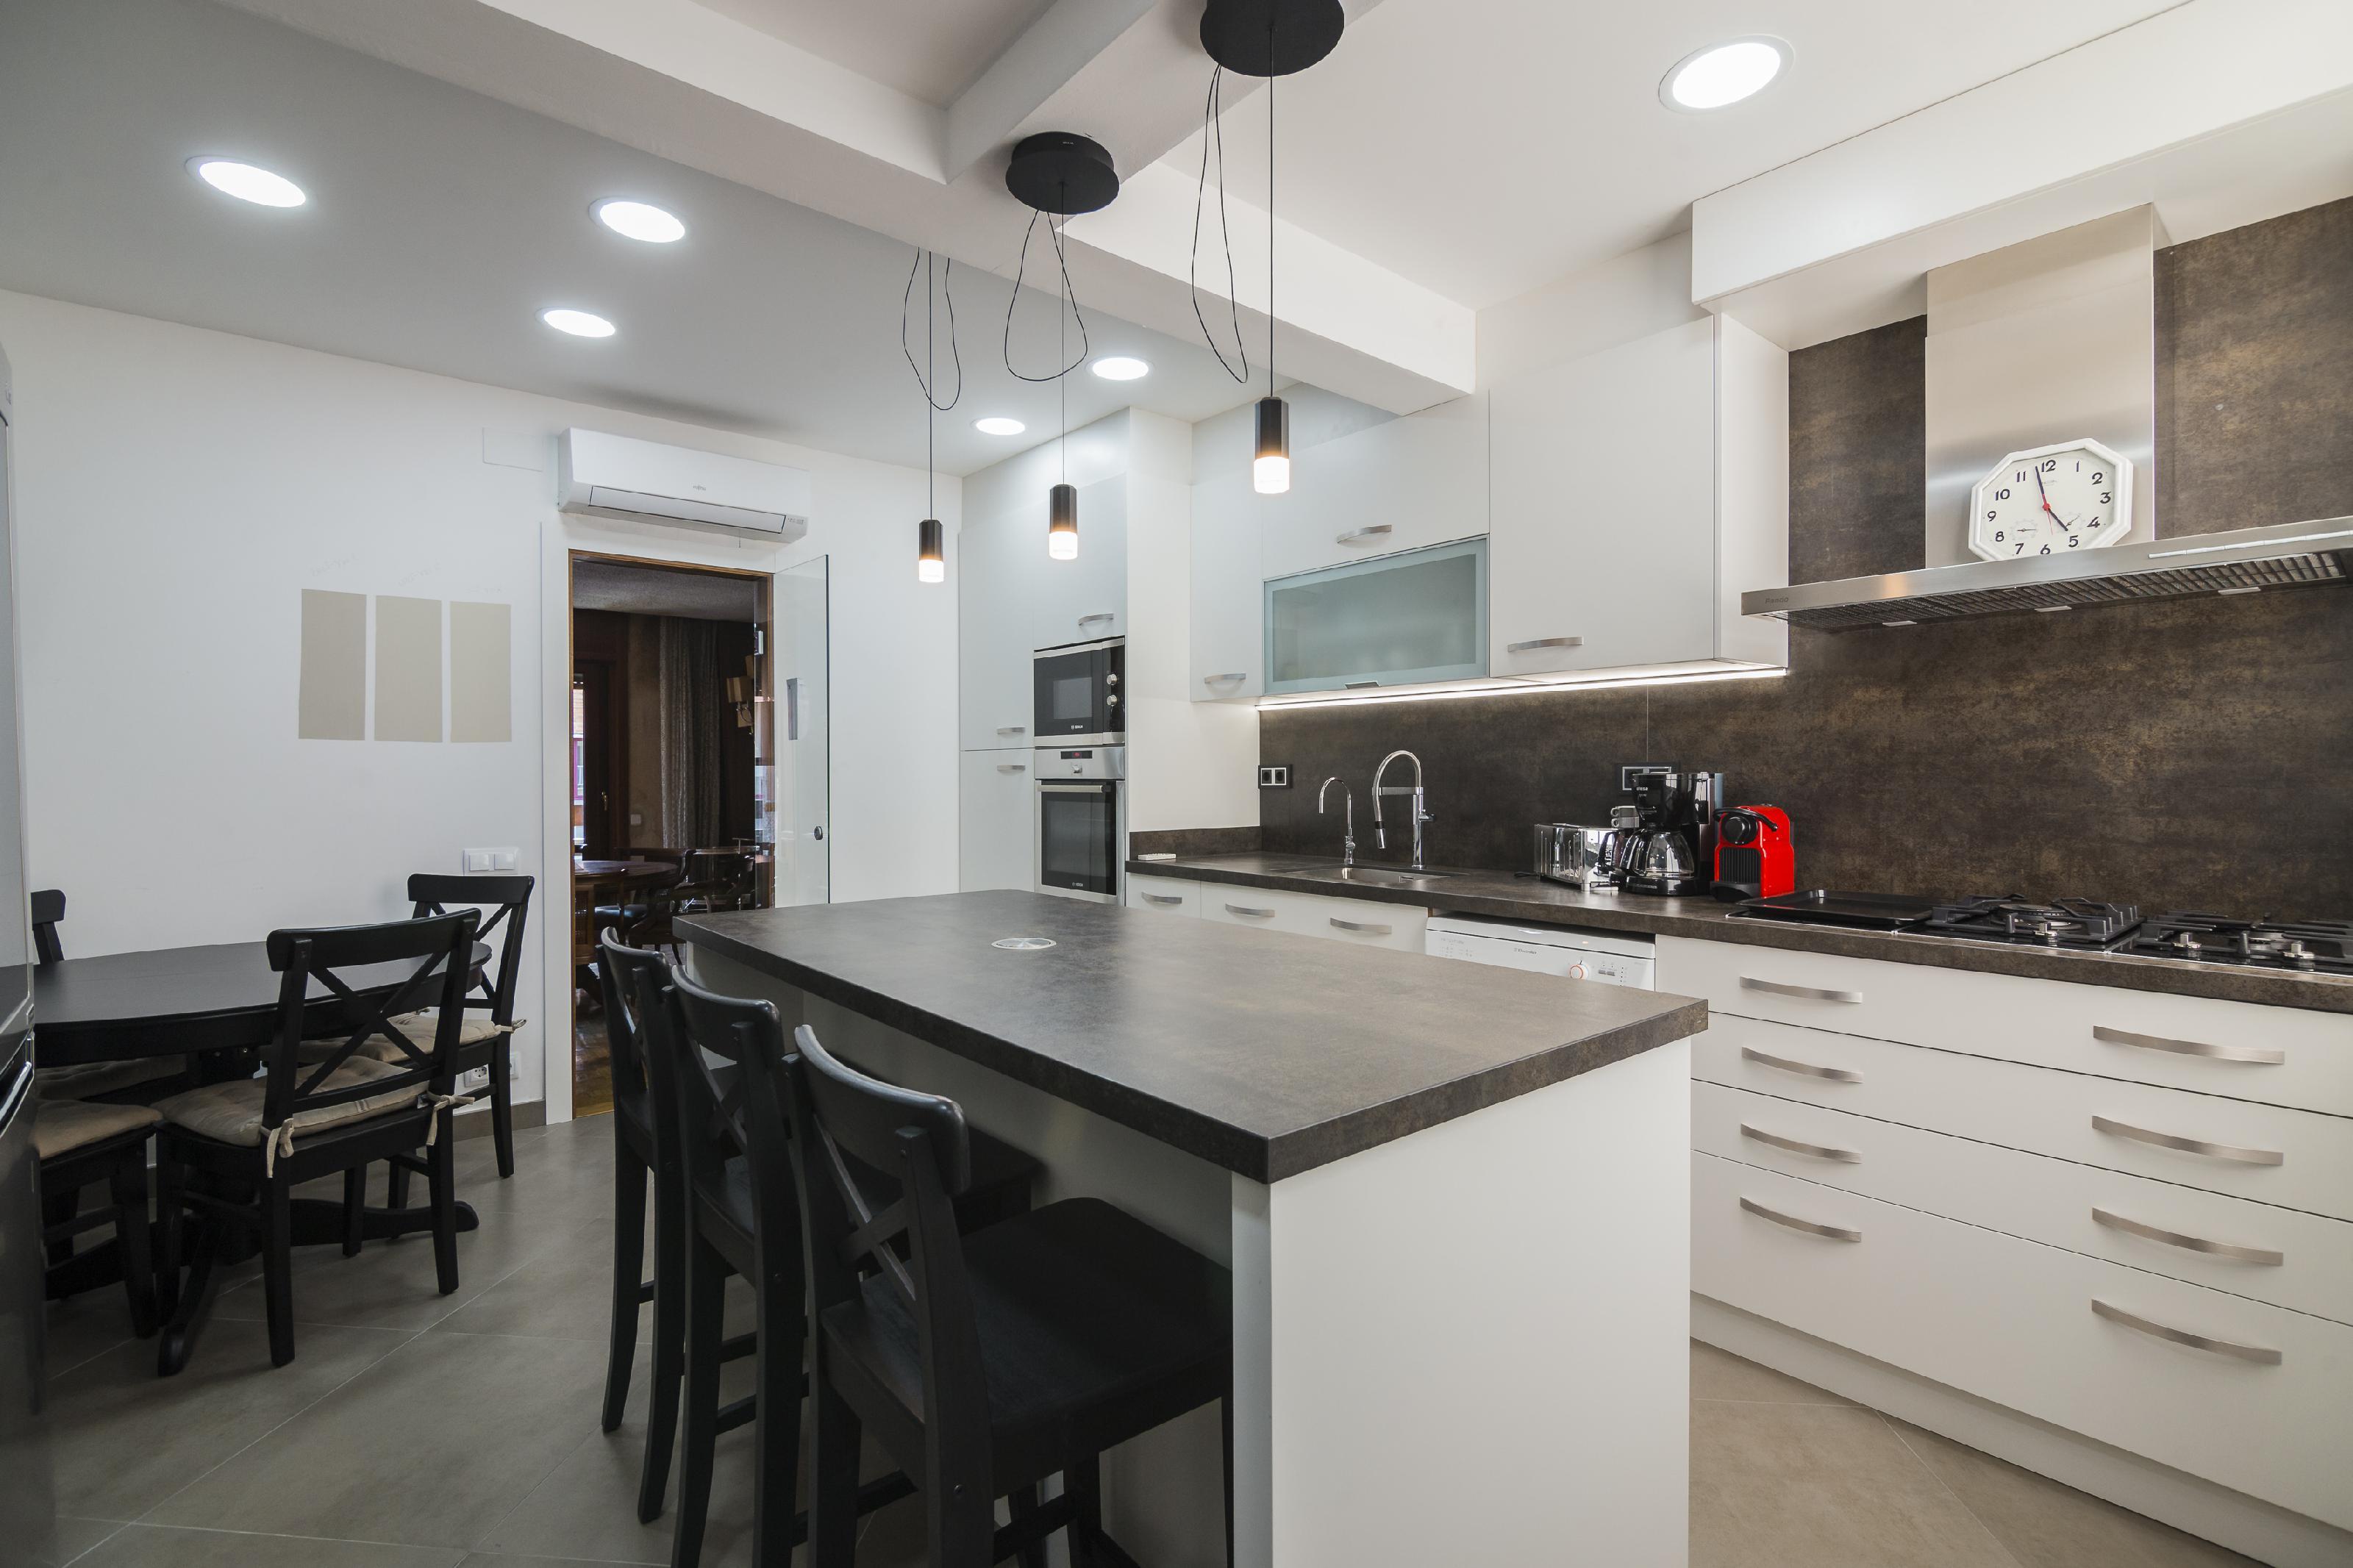 249856 Flat for sale in Sarrià-Sant Gervasi, Sant Gervasi-Galvany 16